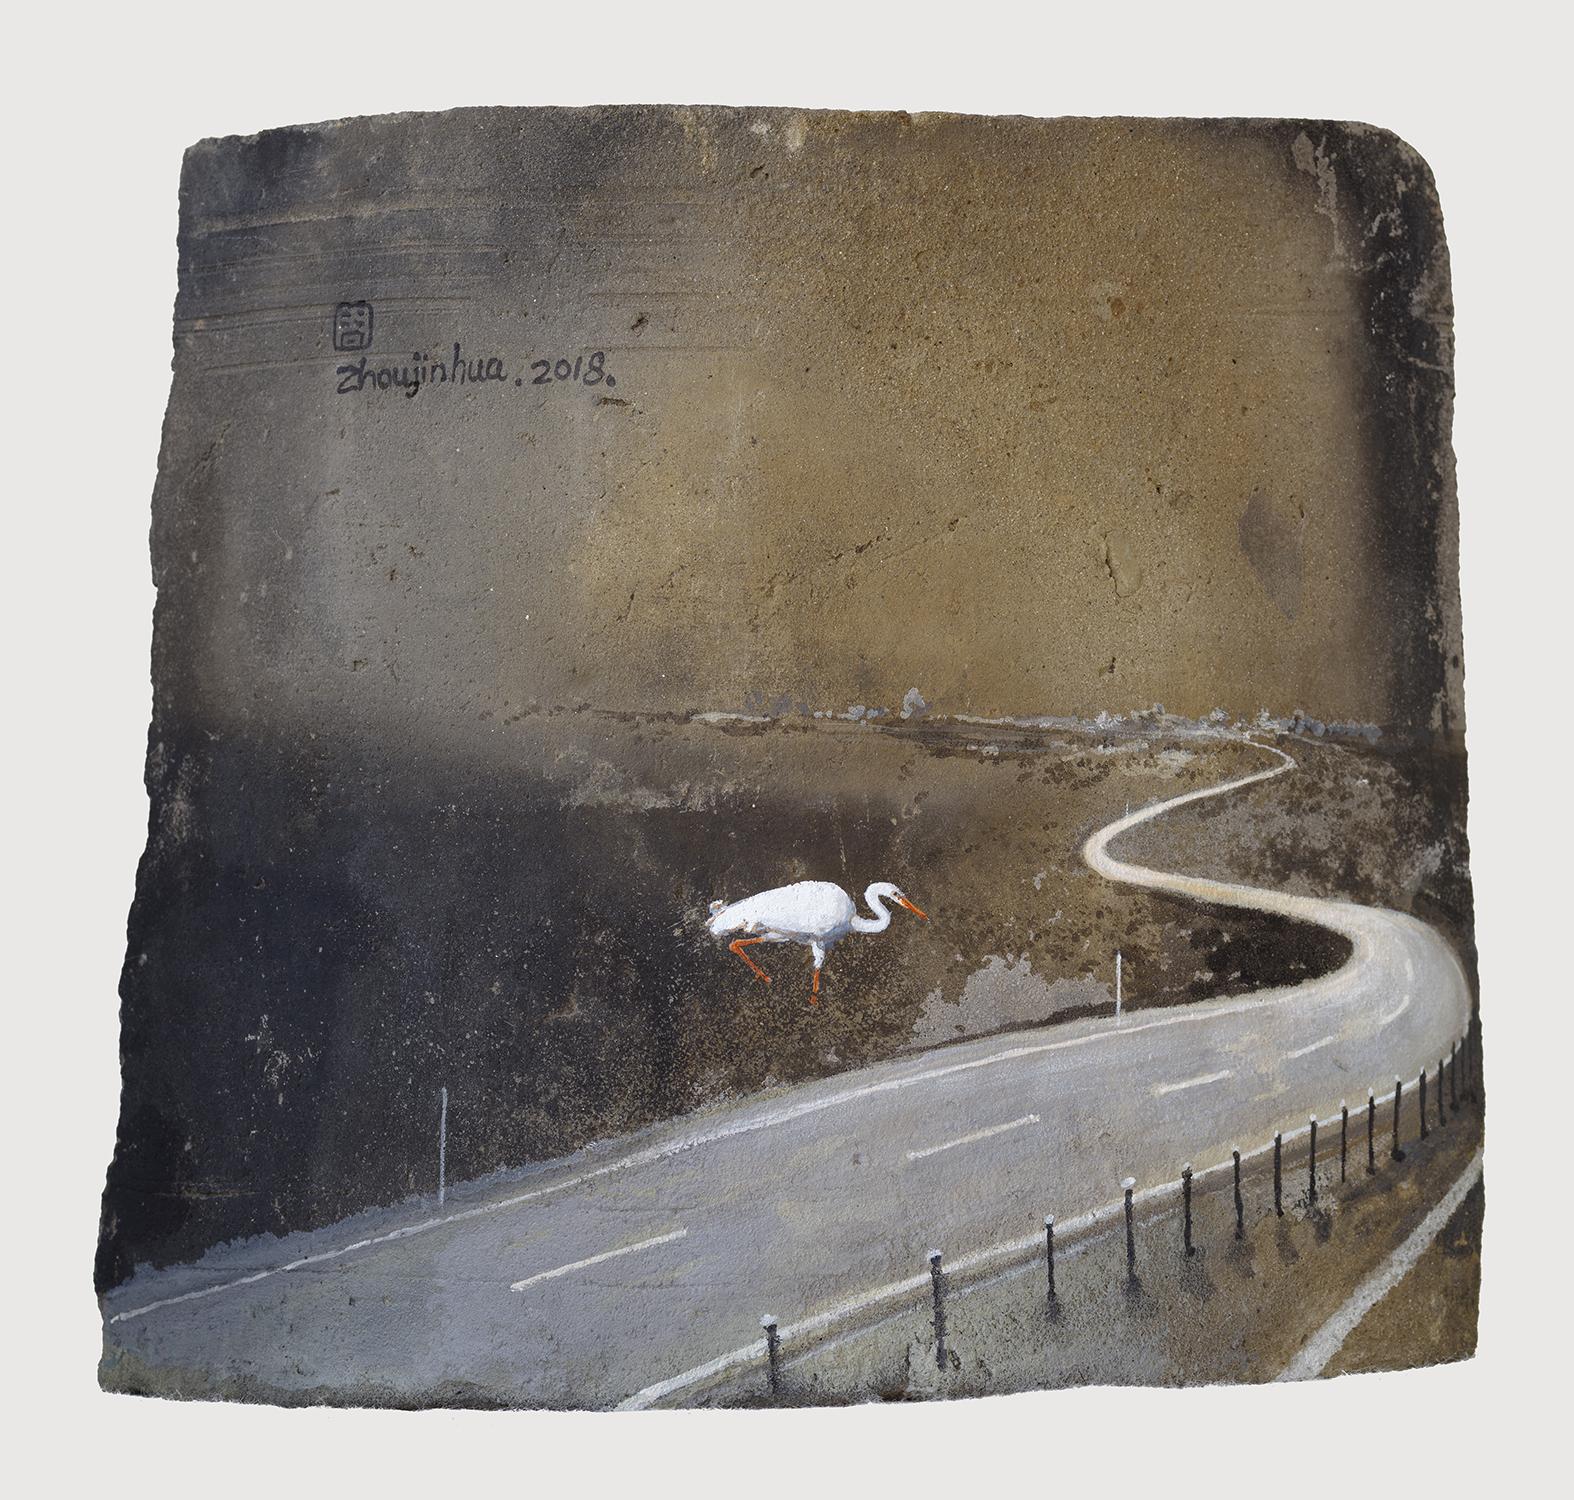 Zhou Jinhua 周金华, Remains of the Day 你我的痕迹 No.18, 2018, Acrylic on roof tile 瓦片、丙烯颜料, 17.5 x 19.5 cm